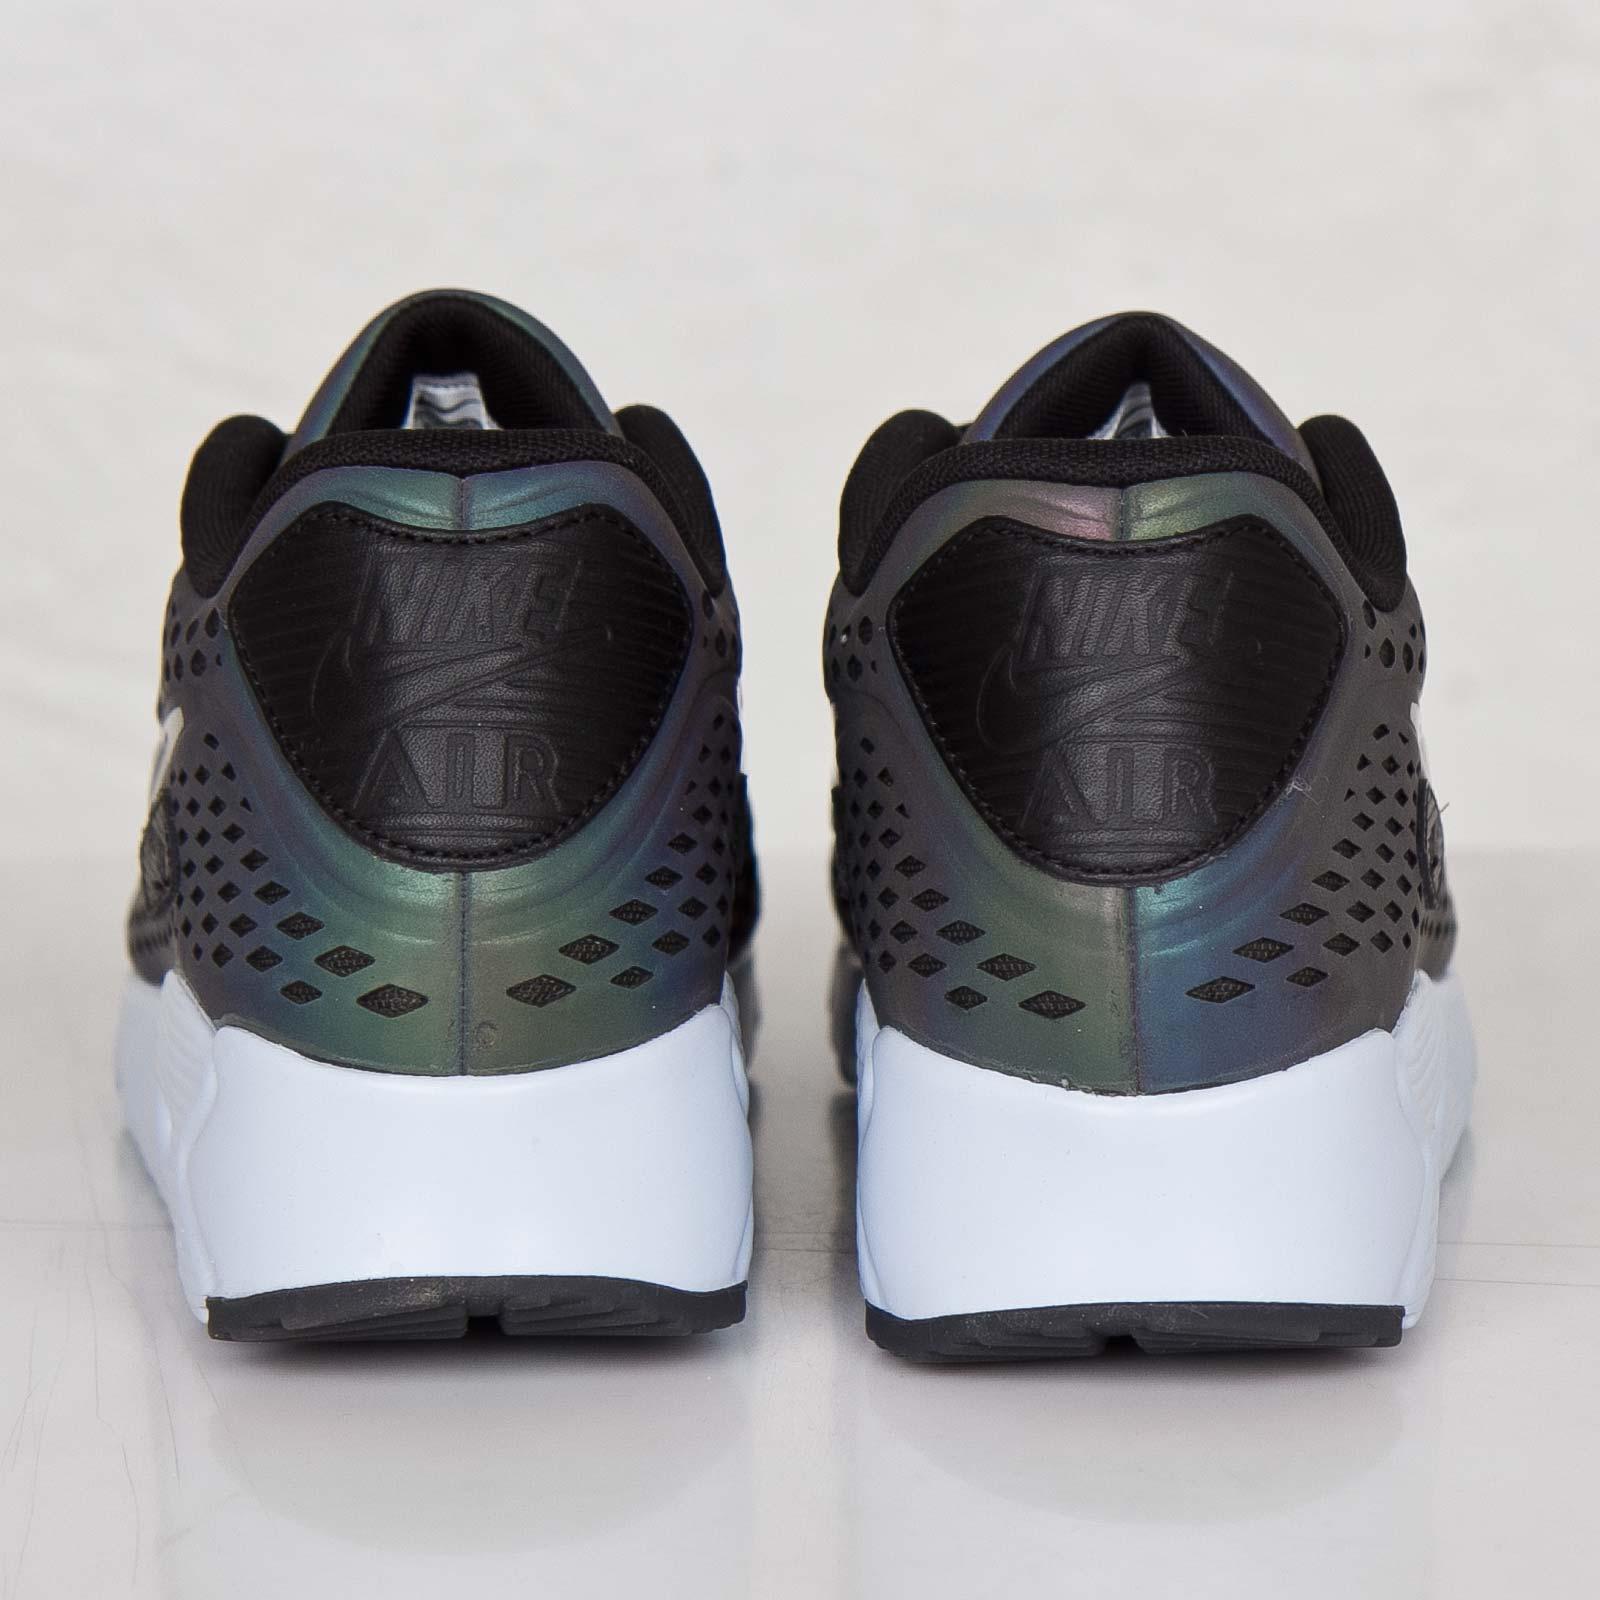 Nike Air Max 90 Ultra Moire QS 777427 200 Sneakersnstuff